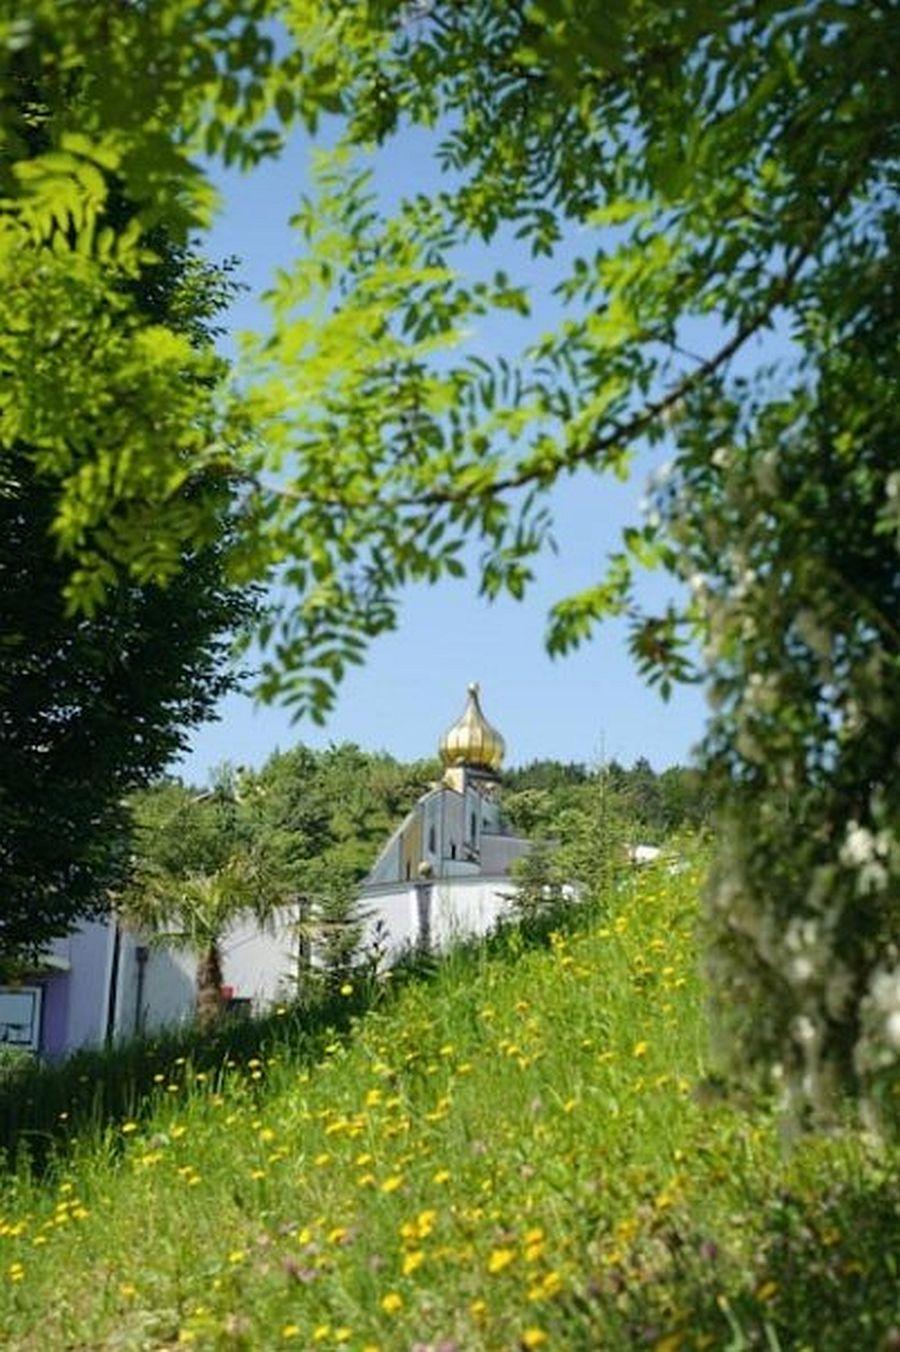 adelaparvu.com despre statiunea Rogner Bad Blumau, Austria, arhitect Friedensreich Hundertwasser (16)